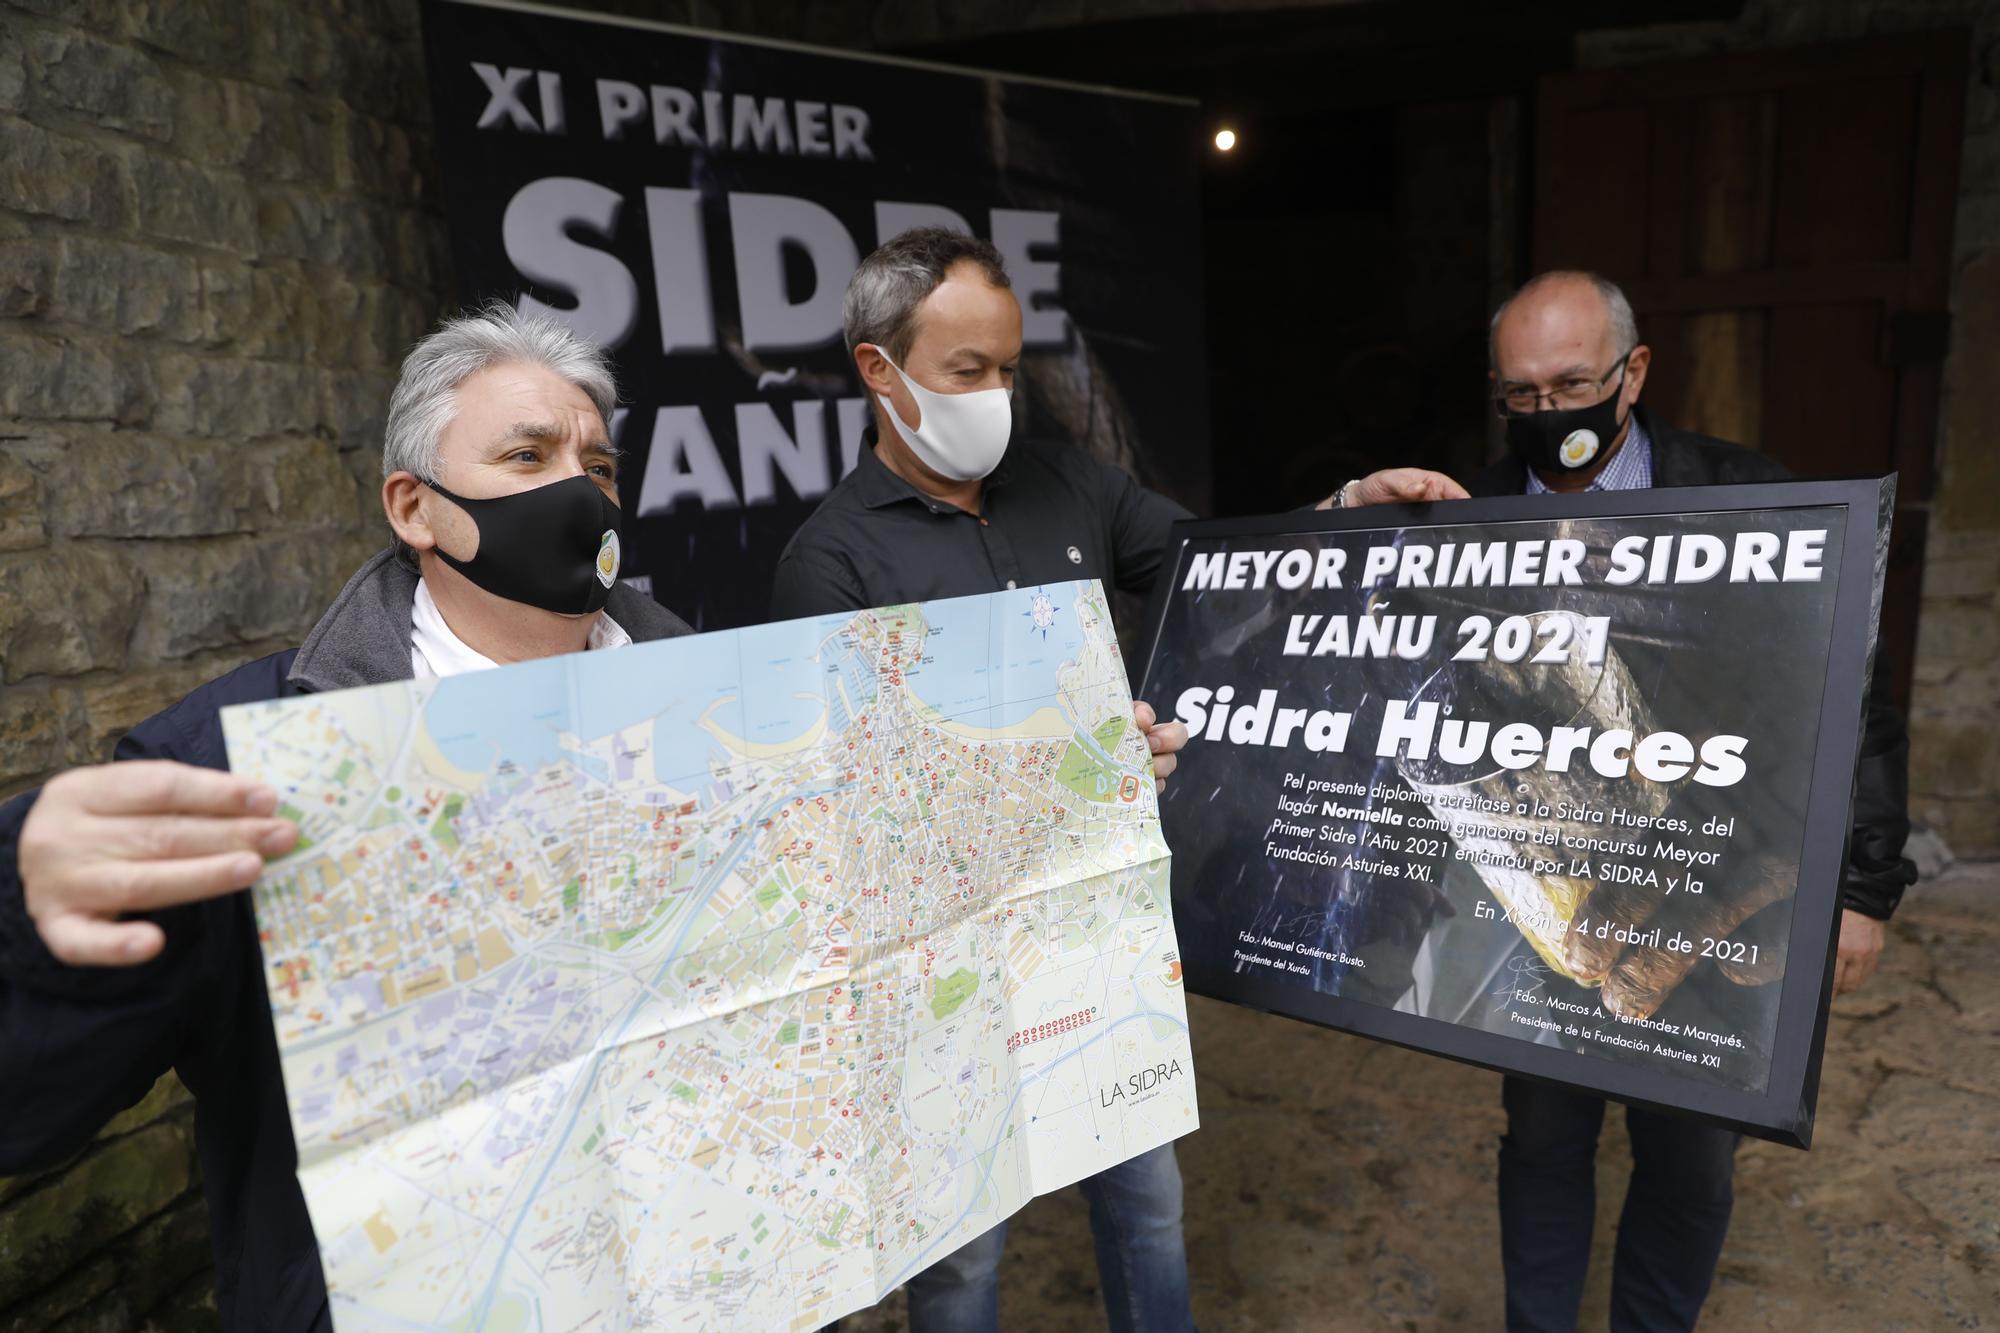 La Primer Sidre de L'Añu vuelve a Gijón